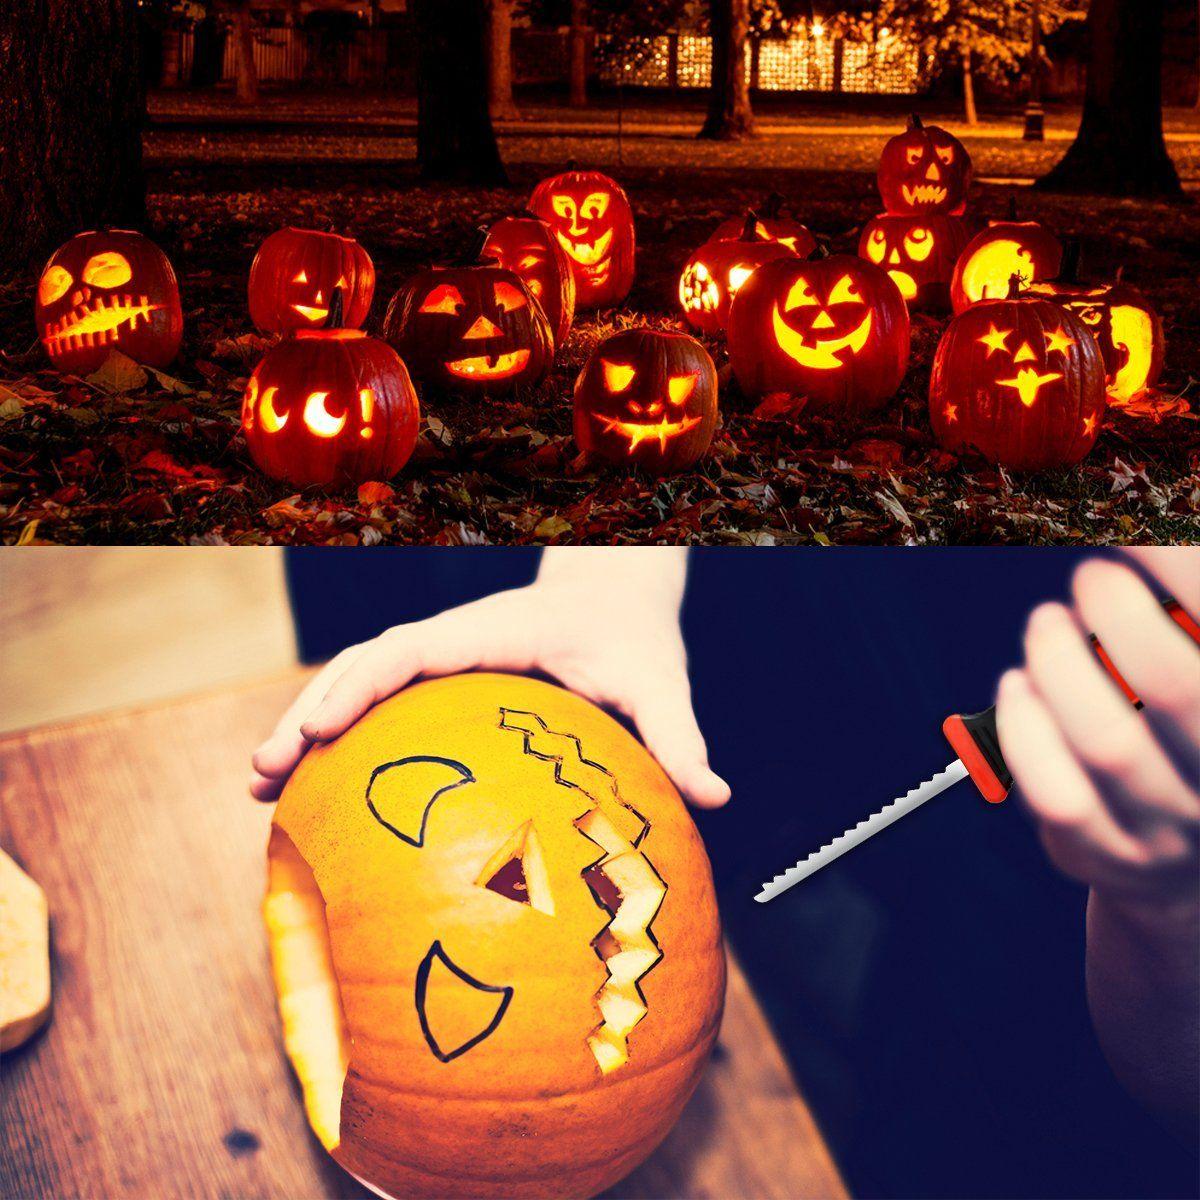 Halloween Pumpkin Carving Kit DIY Adult Kids Children Pumpkin Lantern Carving Toy Knife Set Tools WX9-83